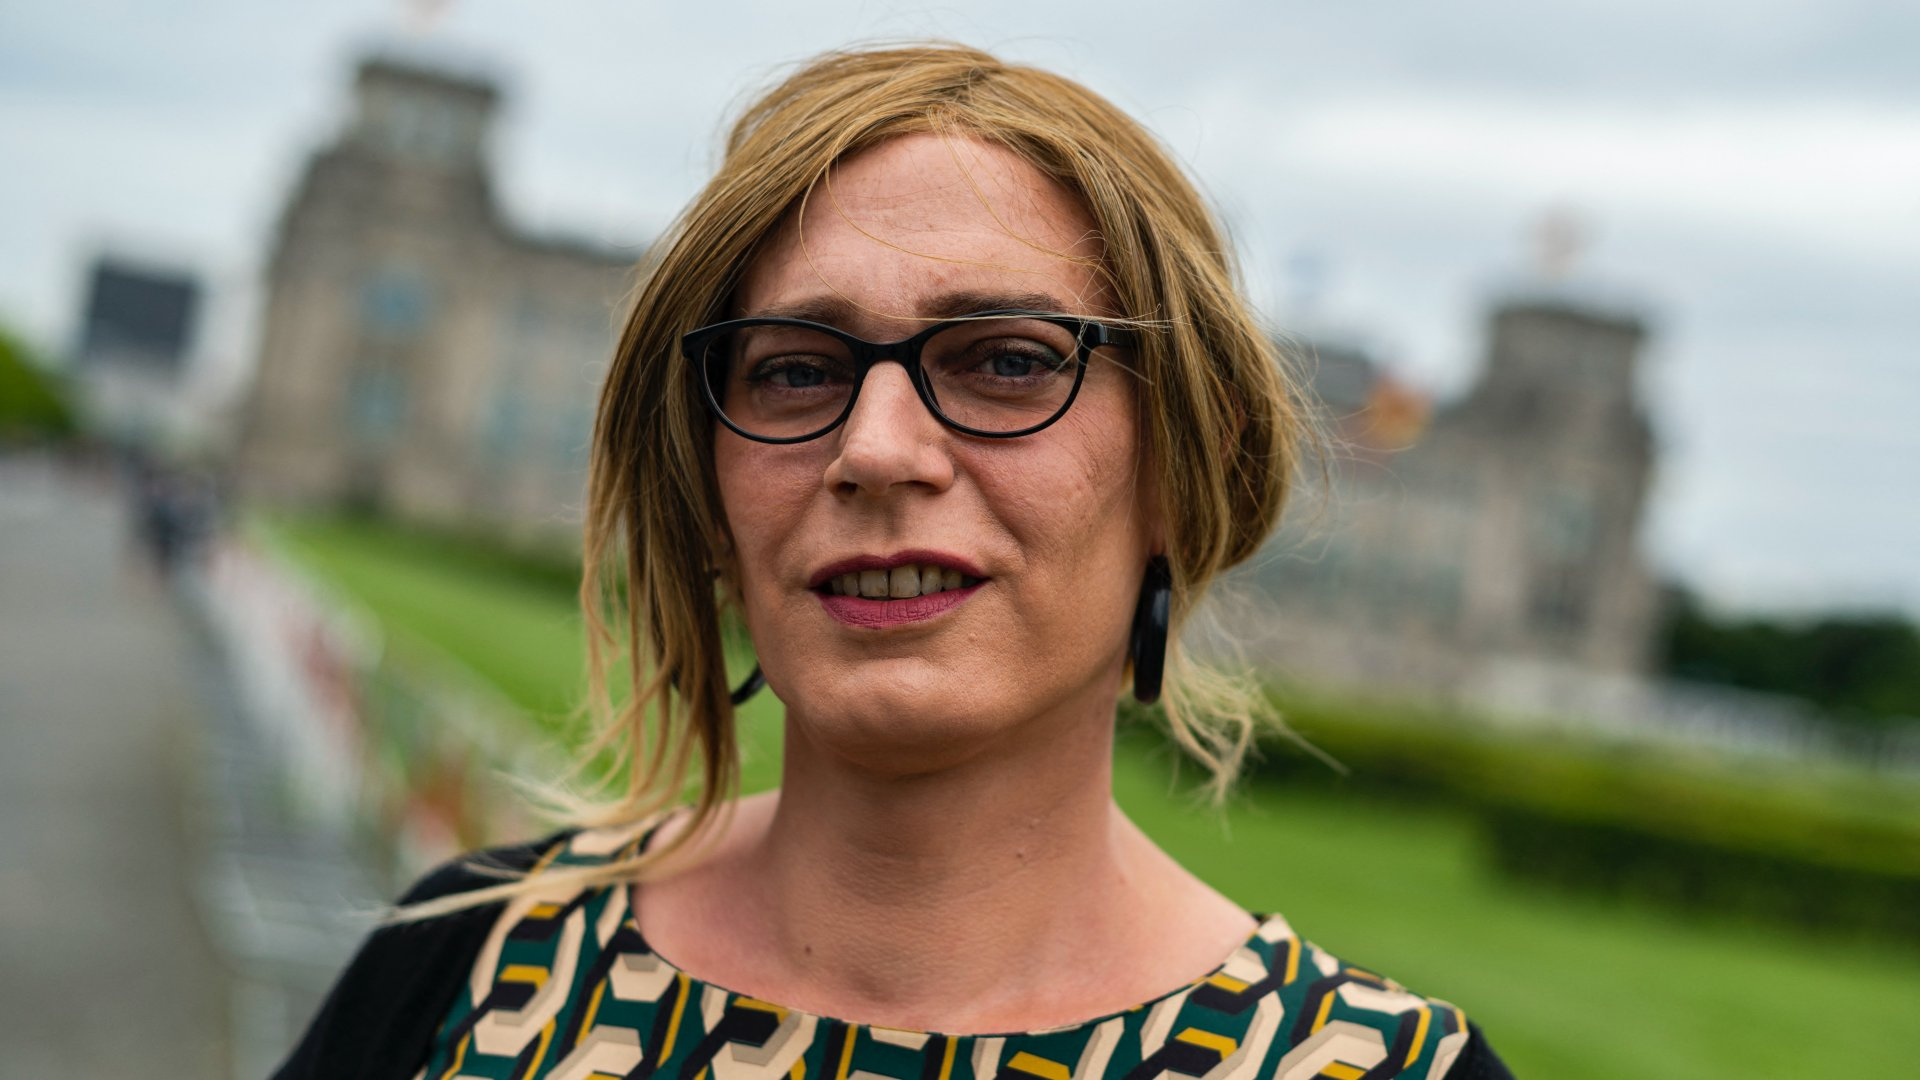 Tessa Ganserer transznemű politikus